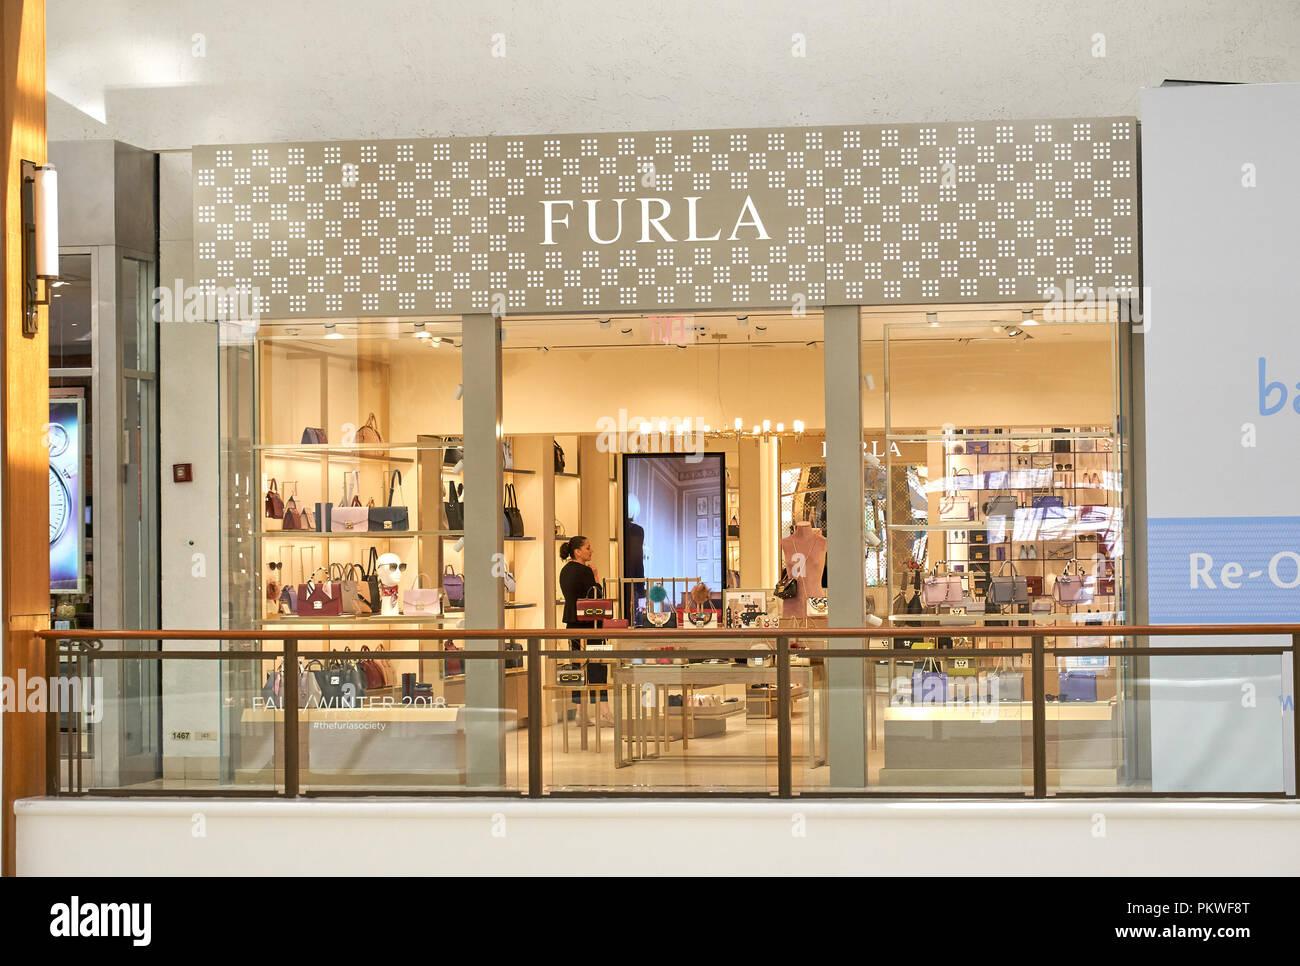 52bcb3b33112f Furla Store Photos   Furla Store Images - Alamy